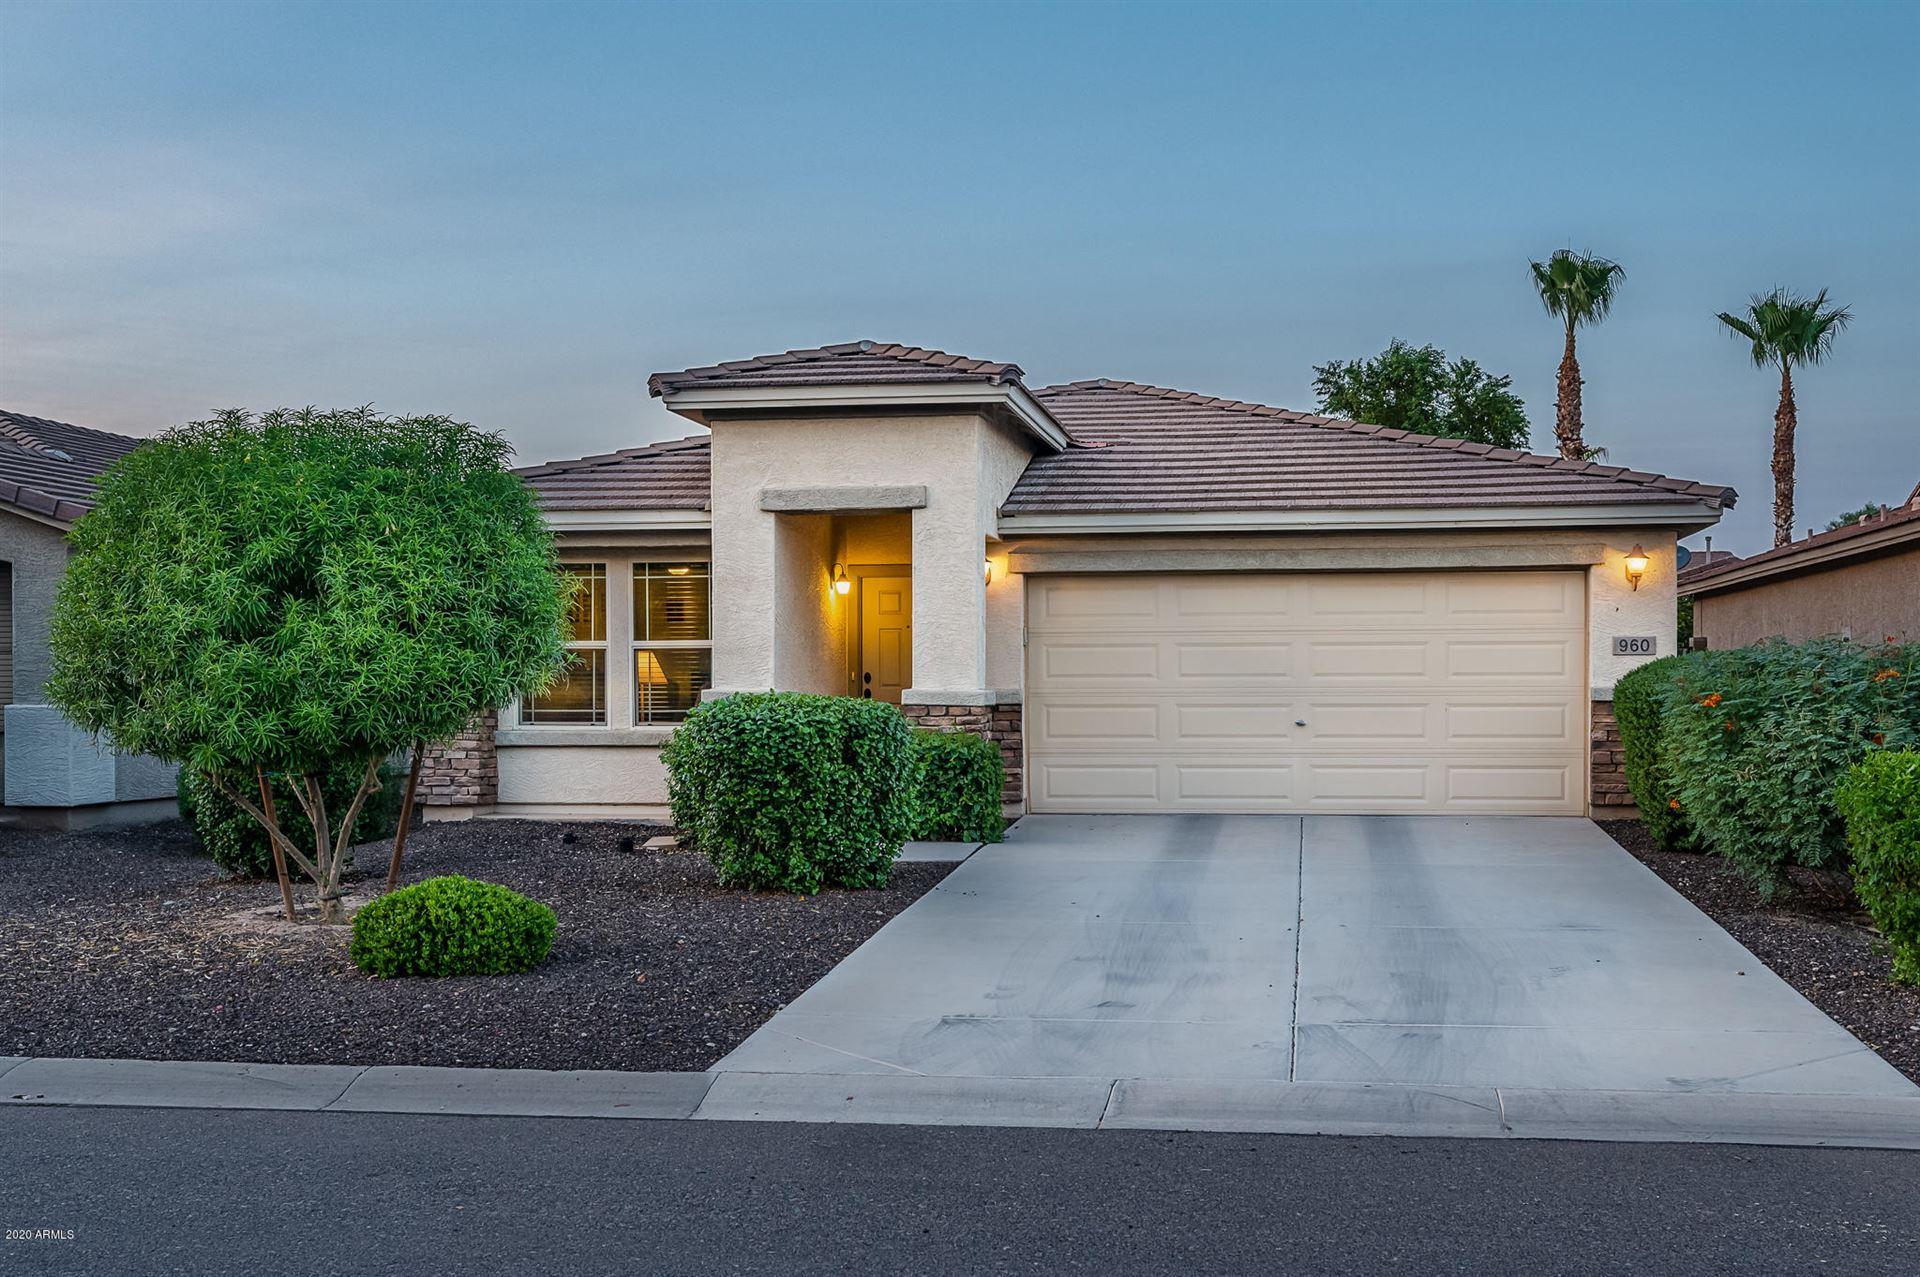 960 E LESLIE Avenue, San Tan Valley, AZ 85140 - MLS#: 6133488